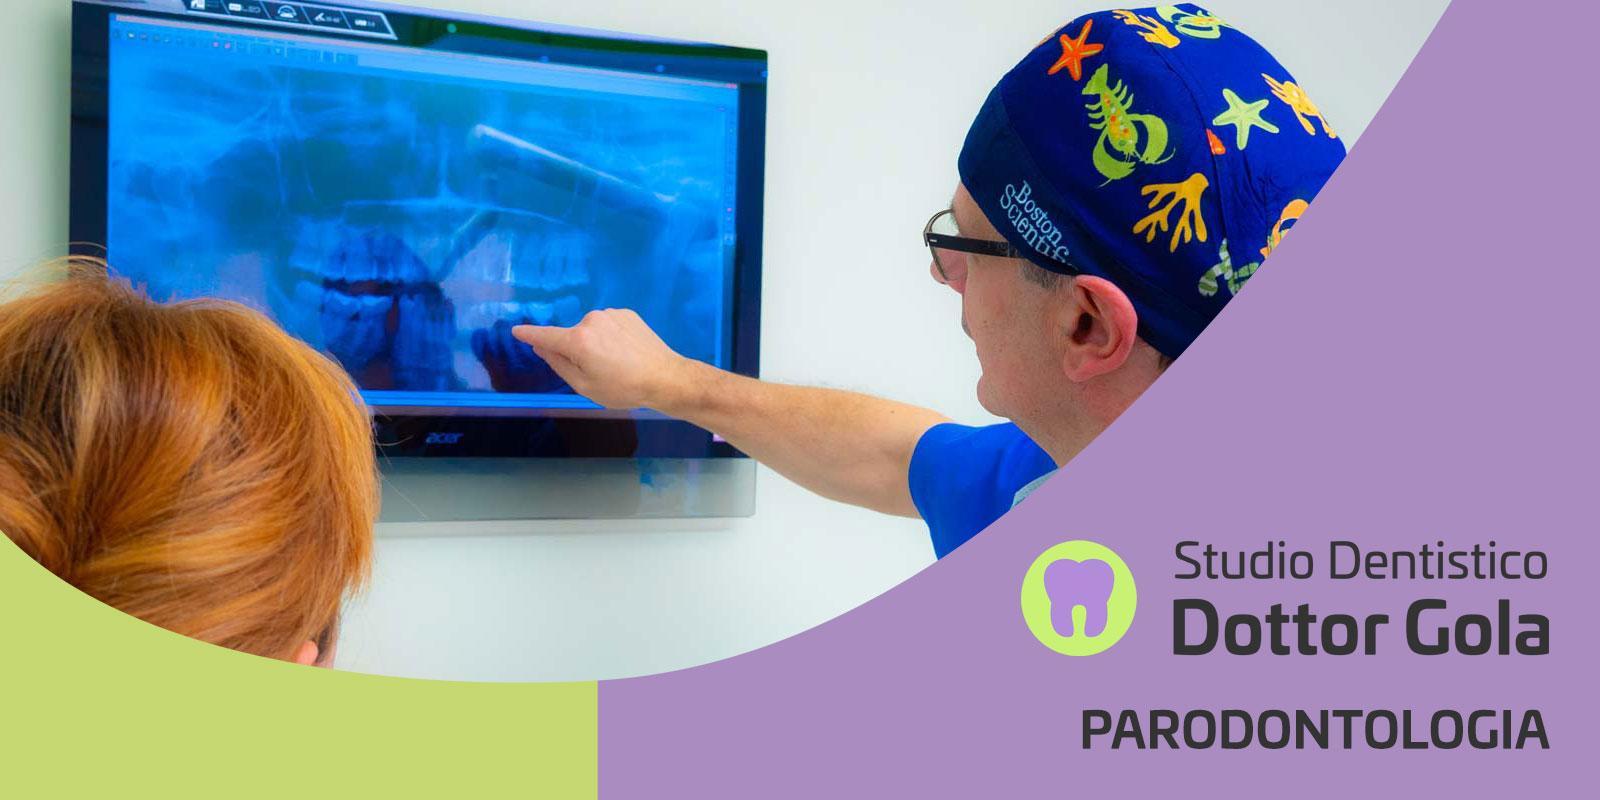 parodontologia-dentista-gola-casteggio-pavia